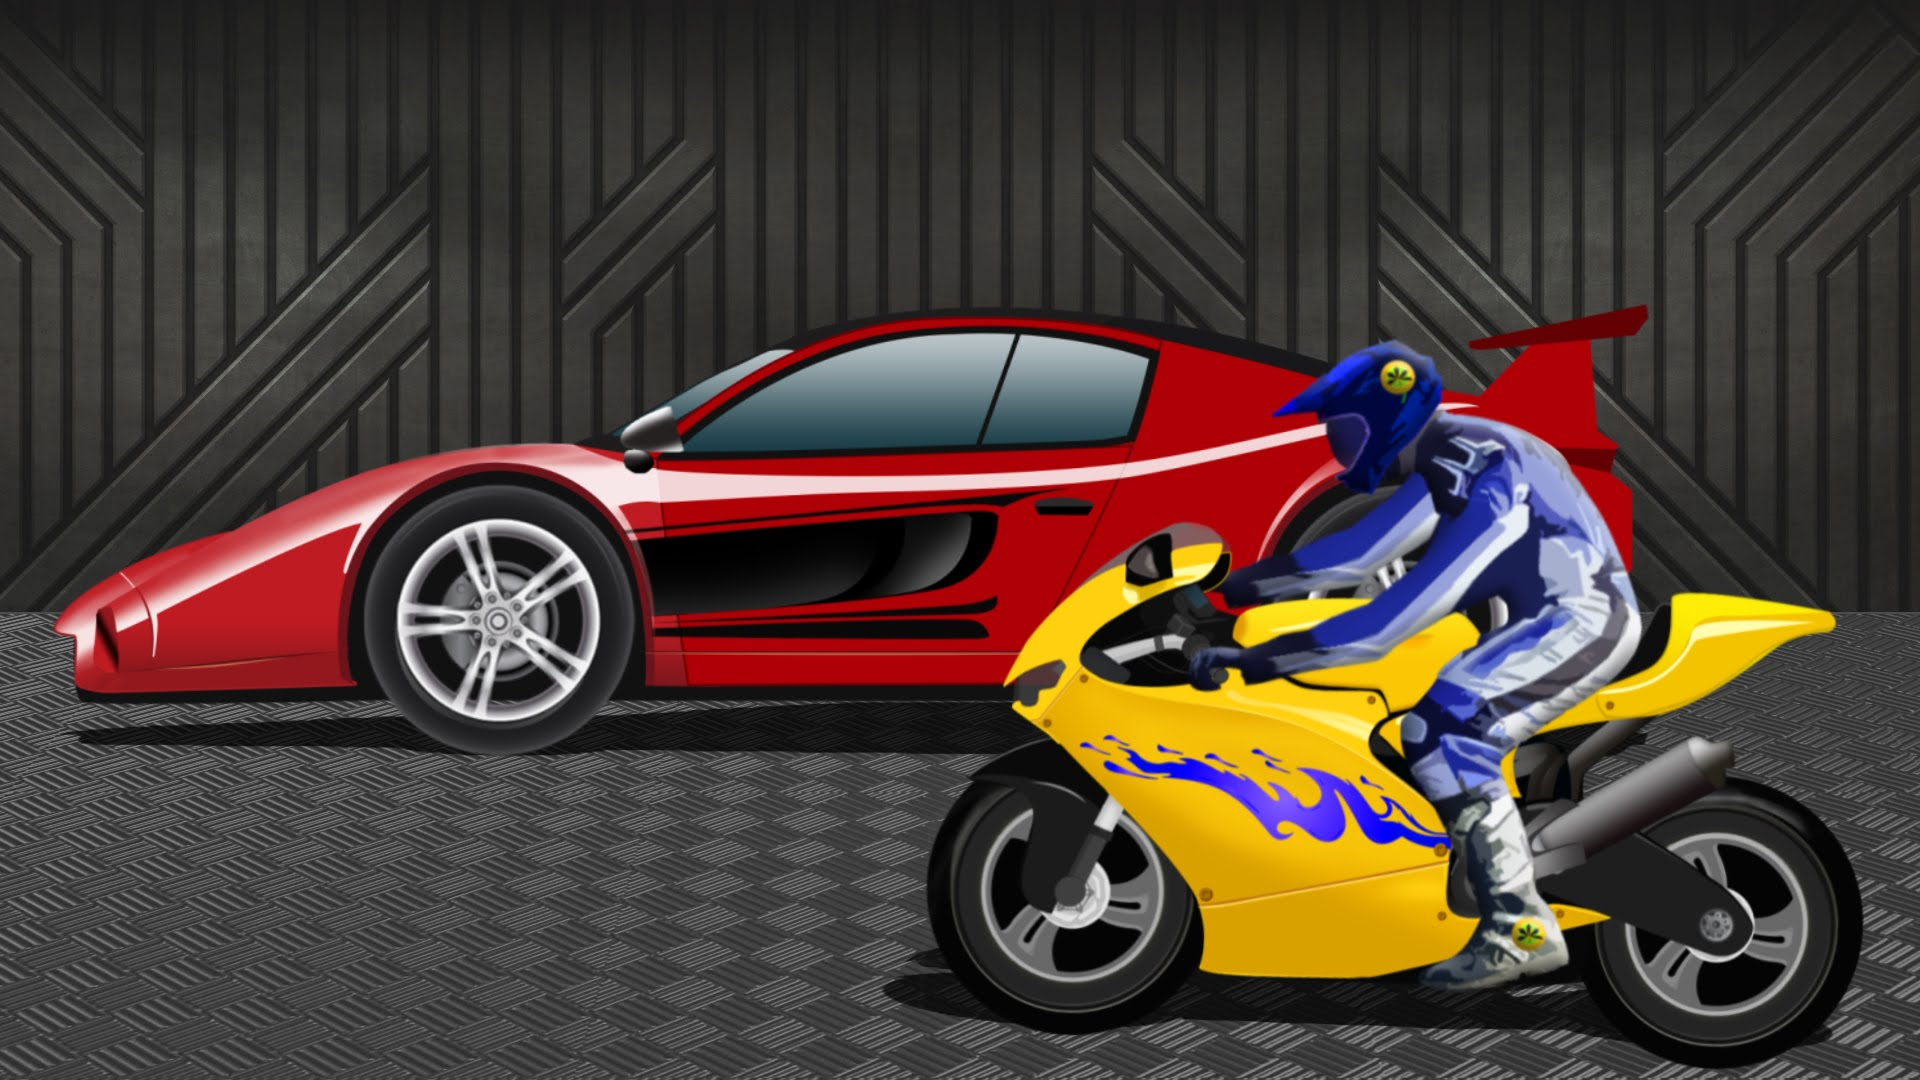 1920x1080 Sports Car Vs Sports Bike Race Video Kids Racing Video